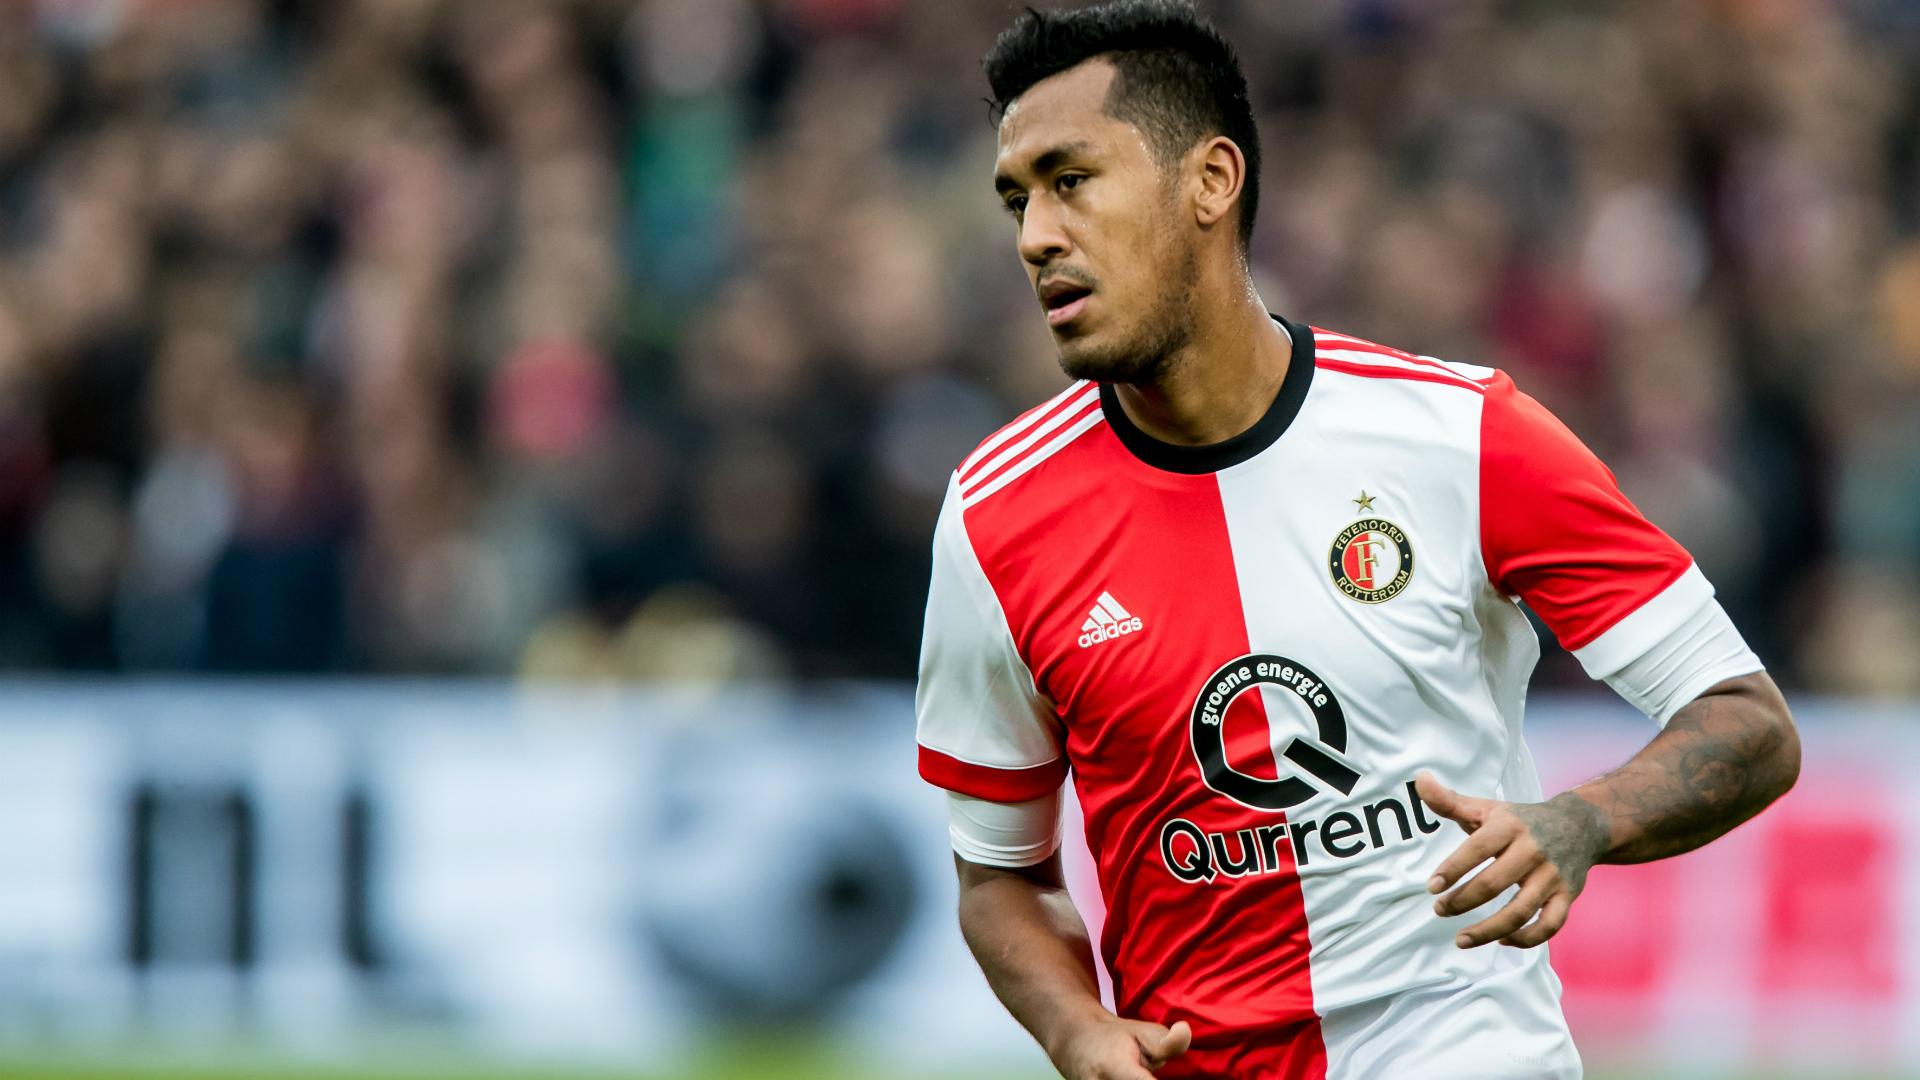 Renato Tapia, Feyenoord, Eredivisie 01282018